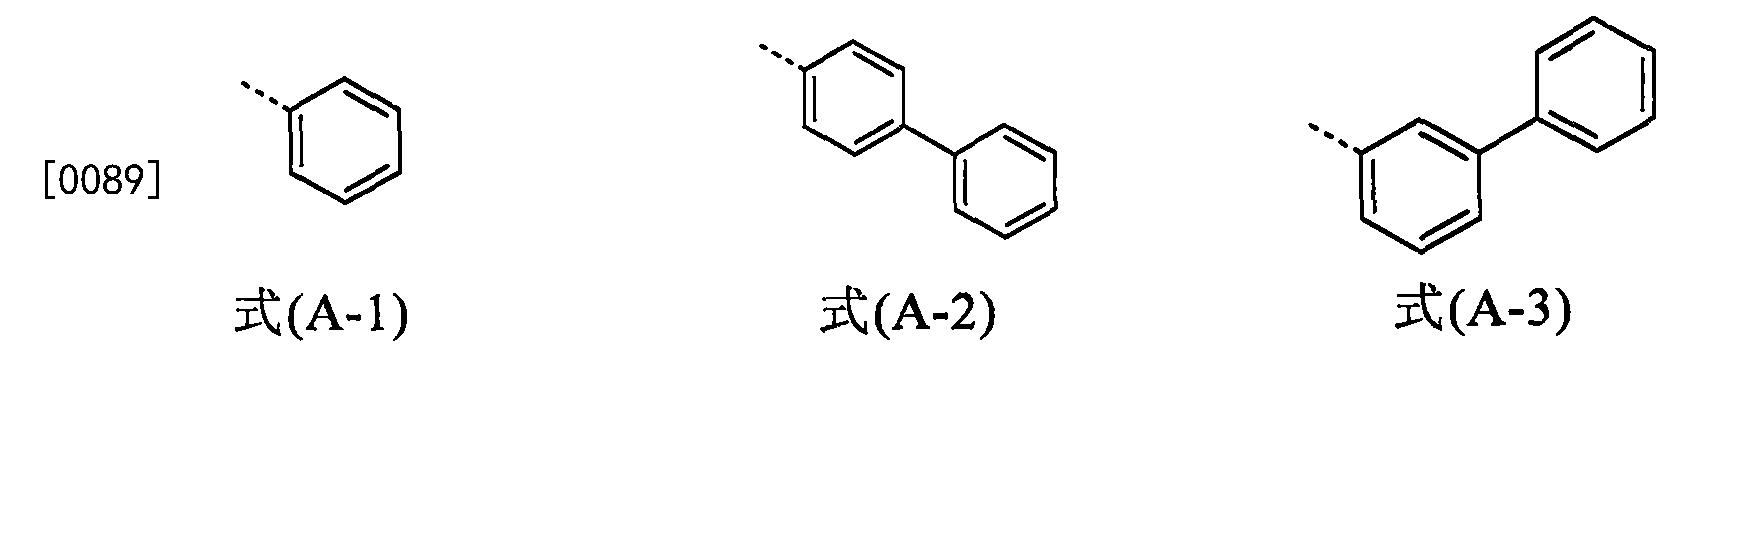 Figure CN107949561AD00152